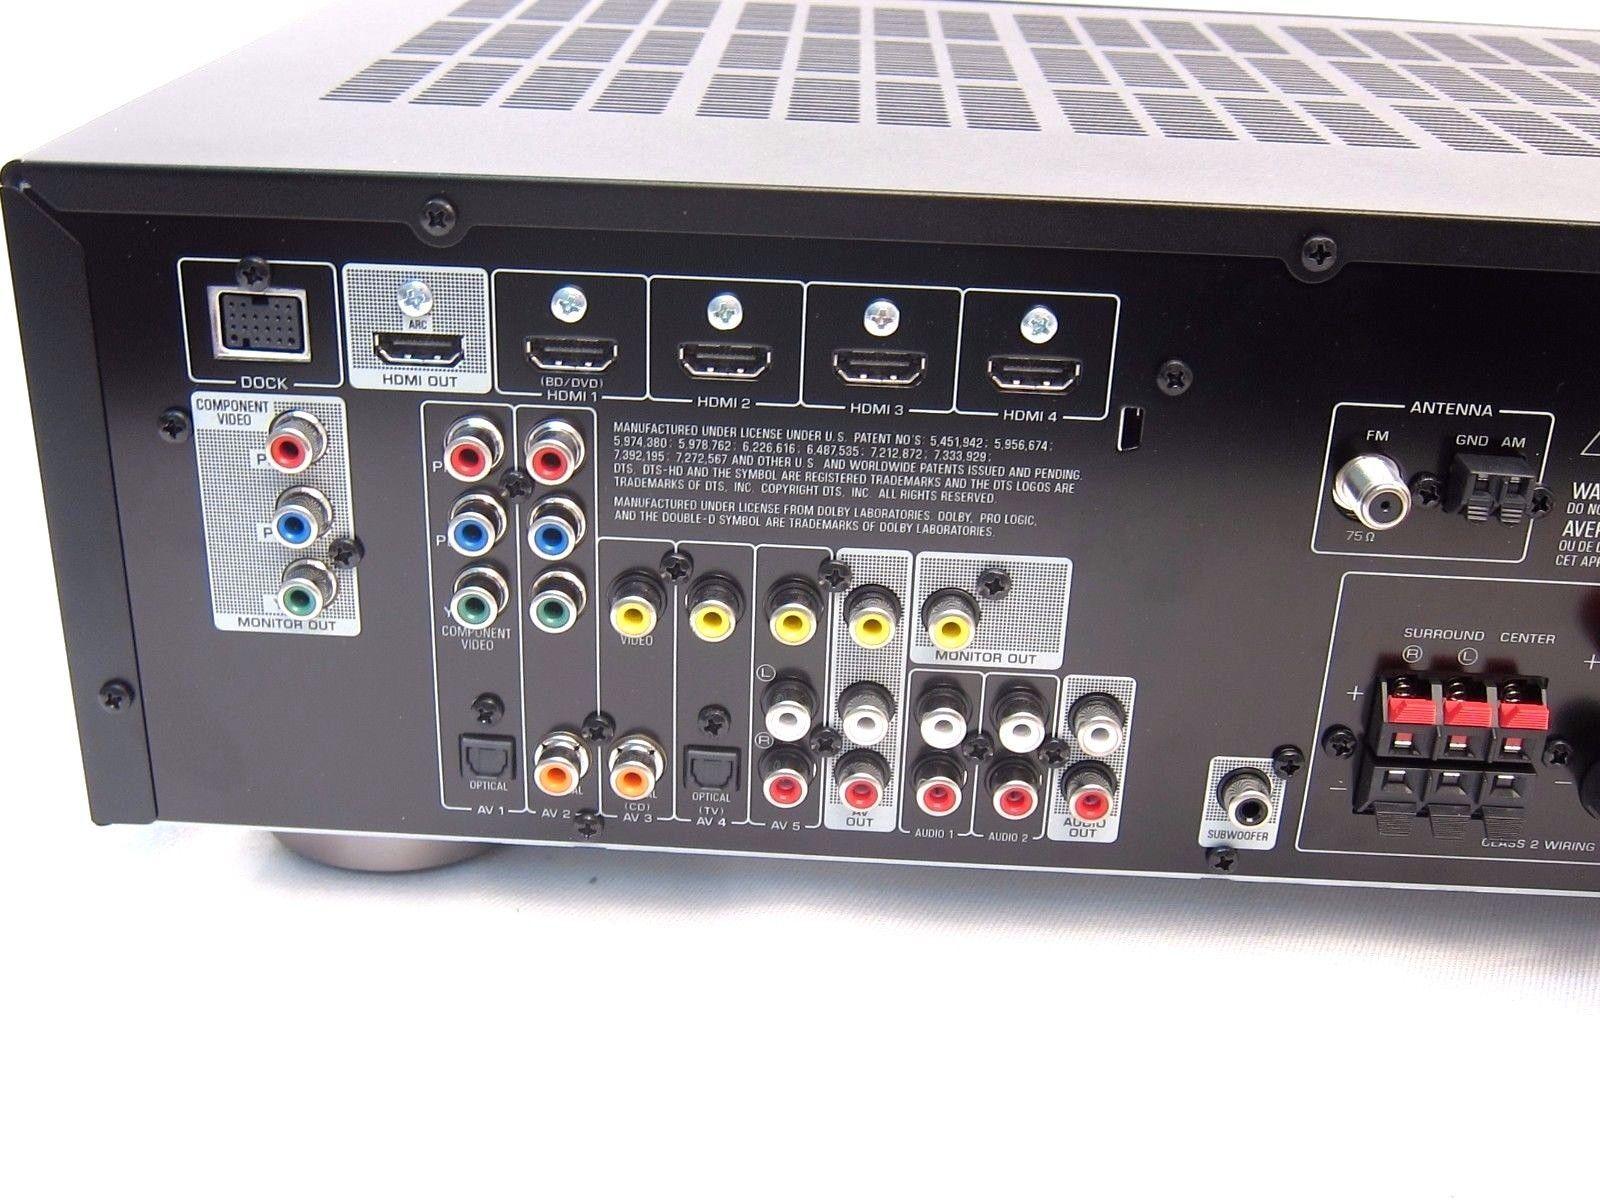 yamaha htr 3064 htr3064 hdmi home theater av receiver